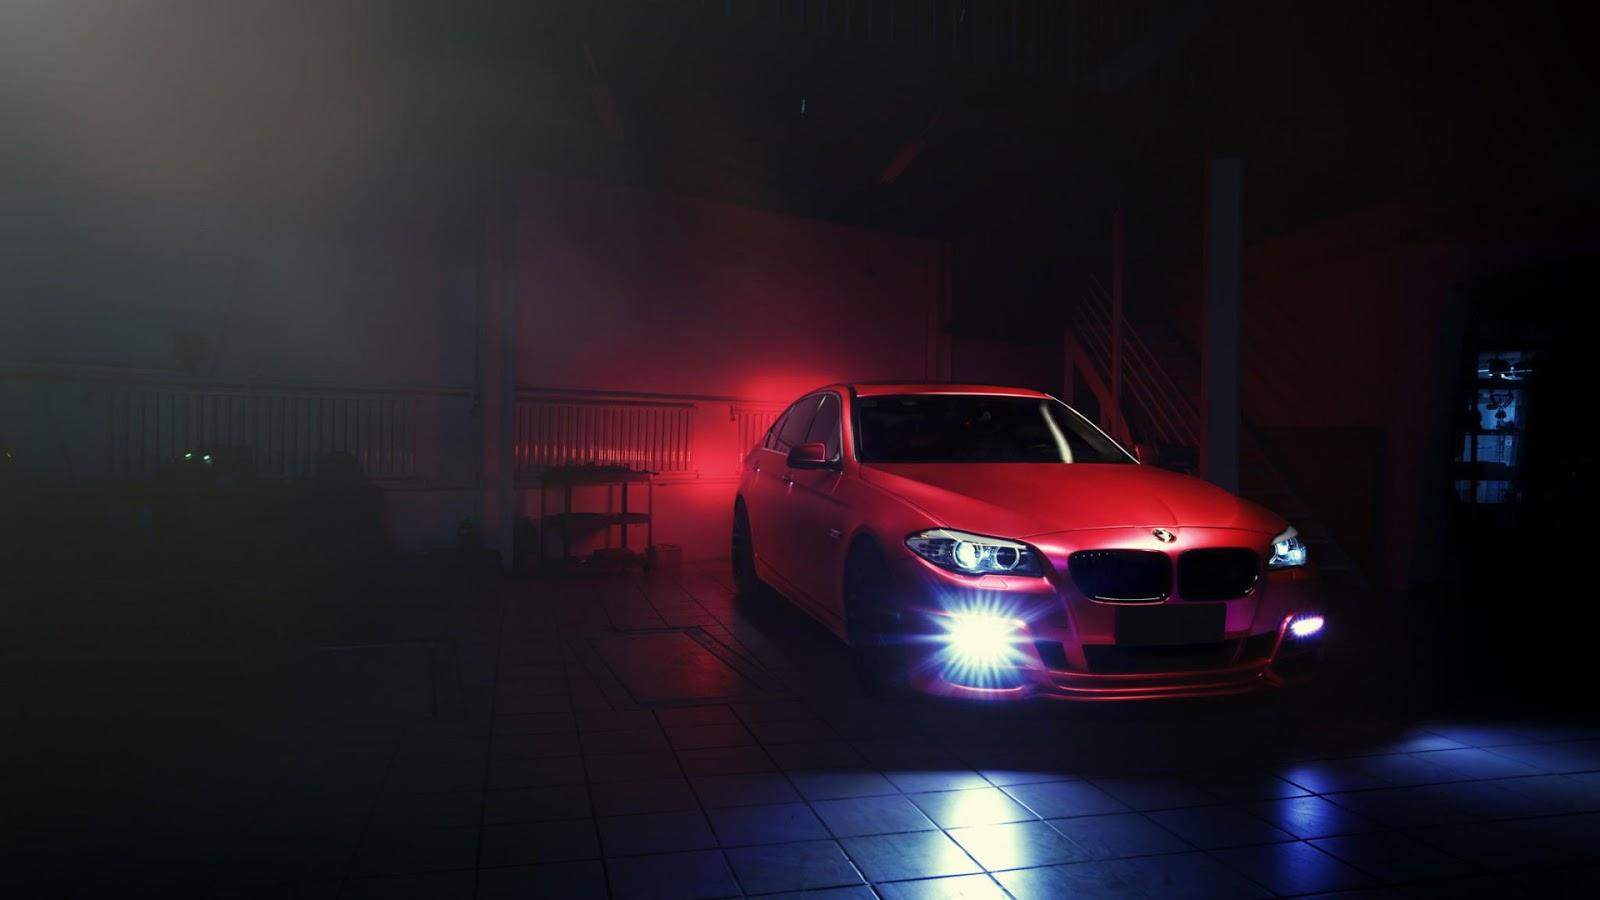 red bmw car hd wallpaper | car hd images | - latest beautiful